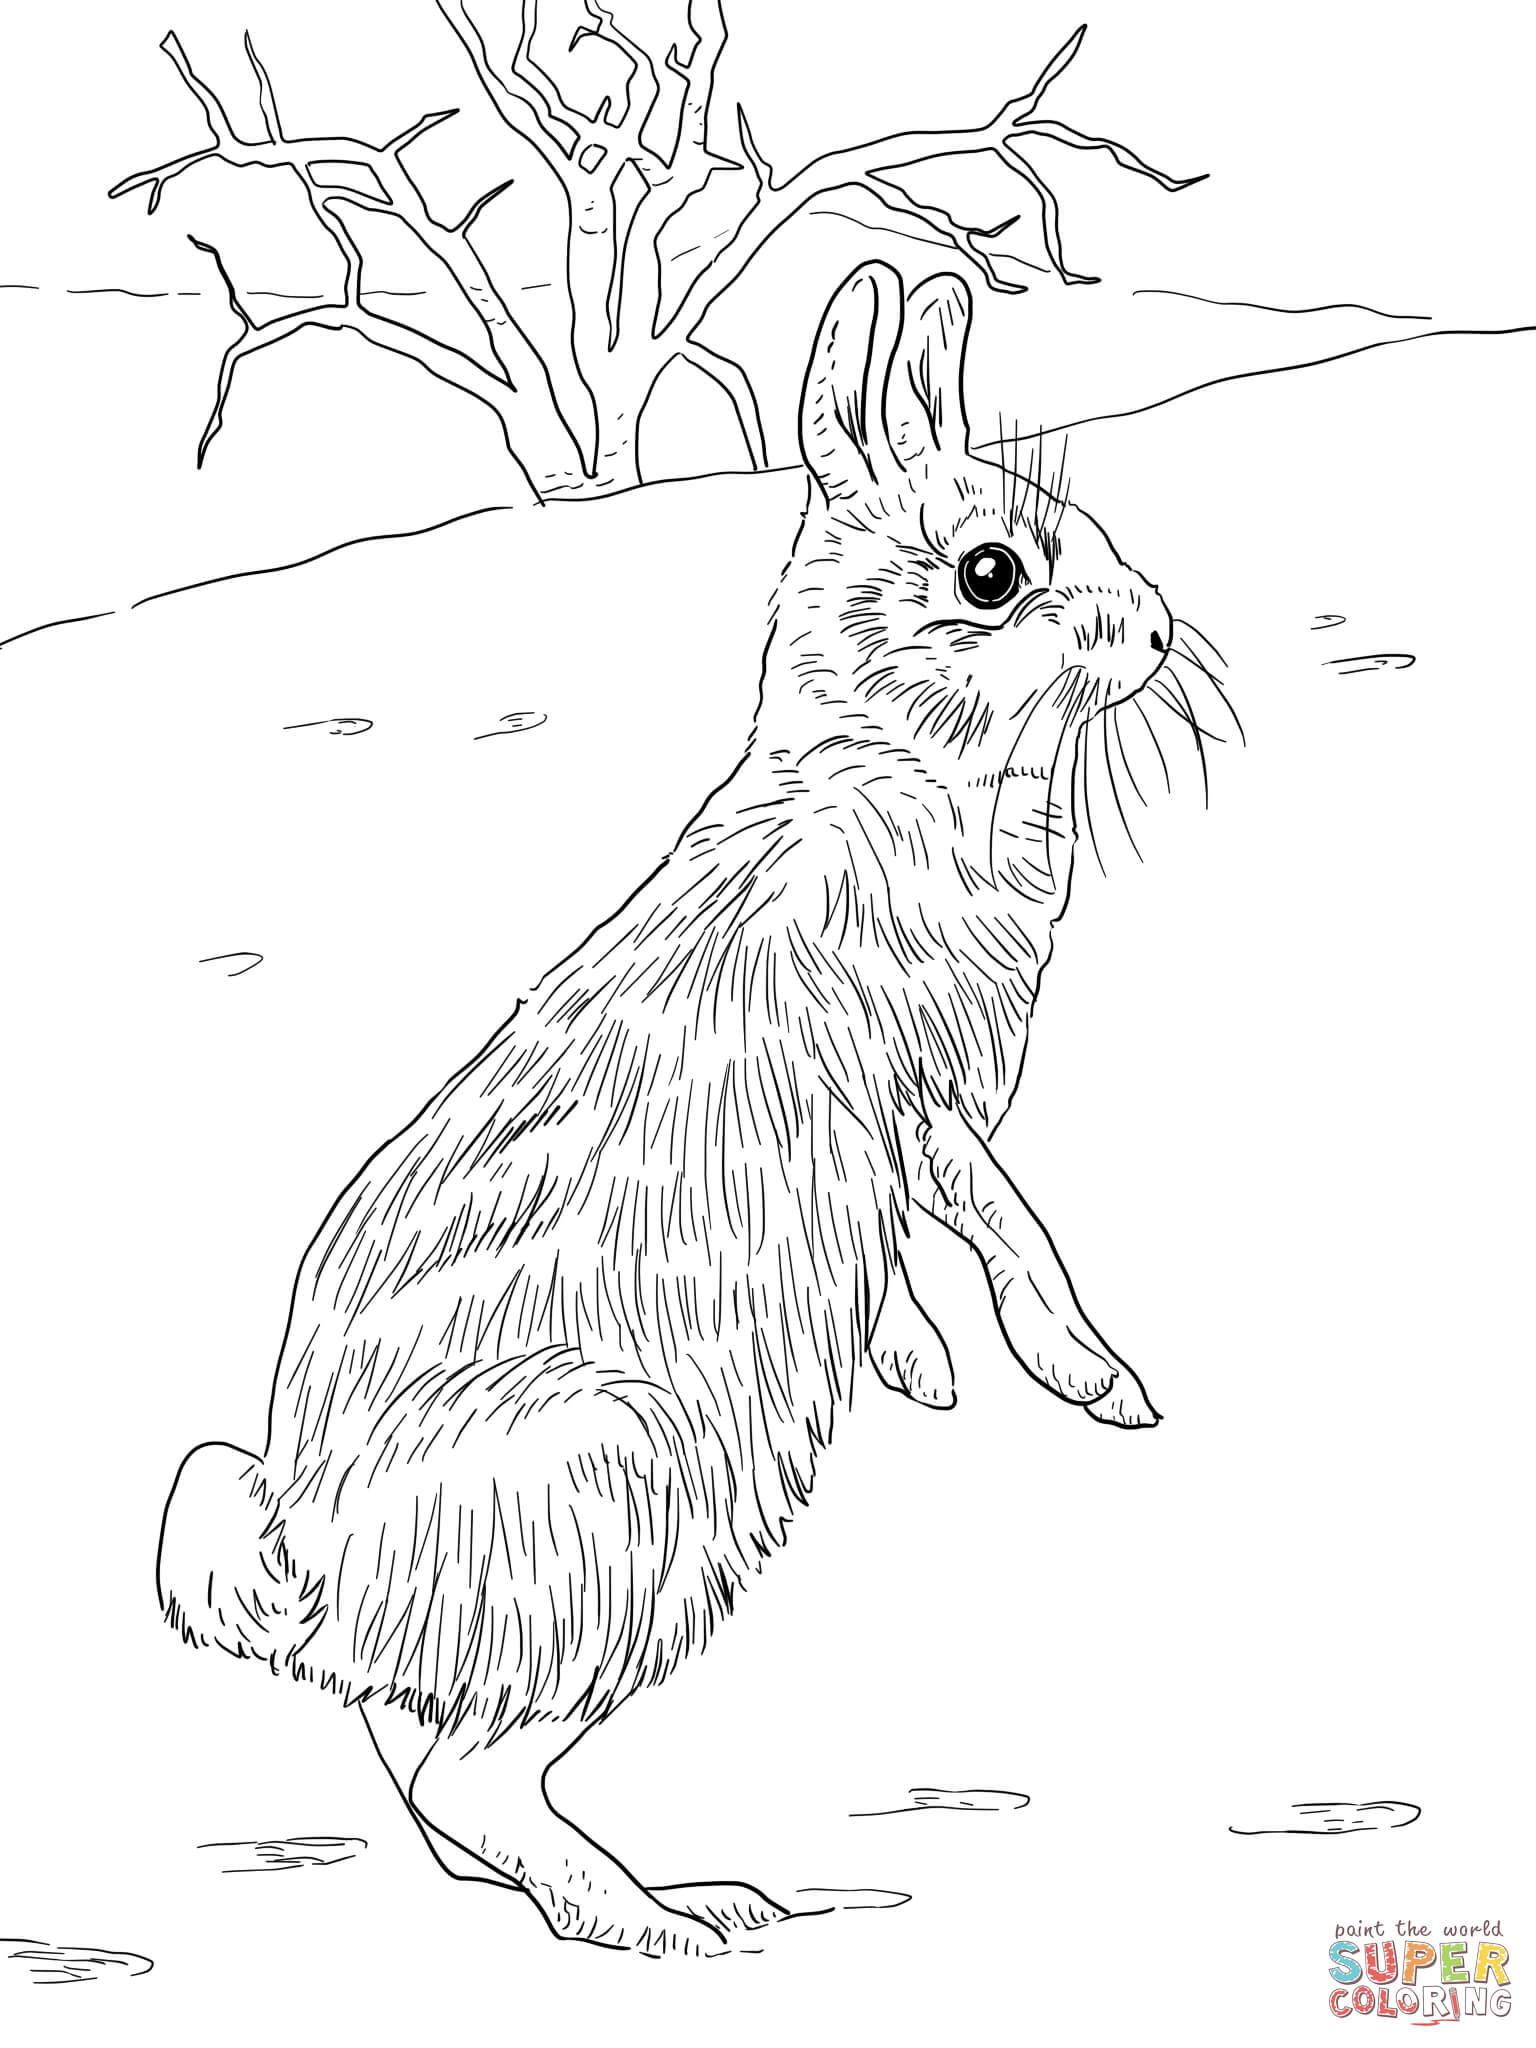 Ideas For Super Coloring Rabbit Anyoneforanyateam